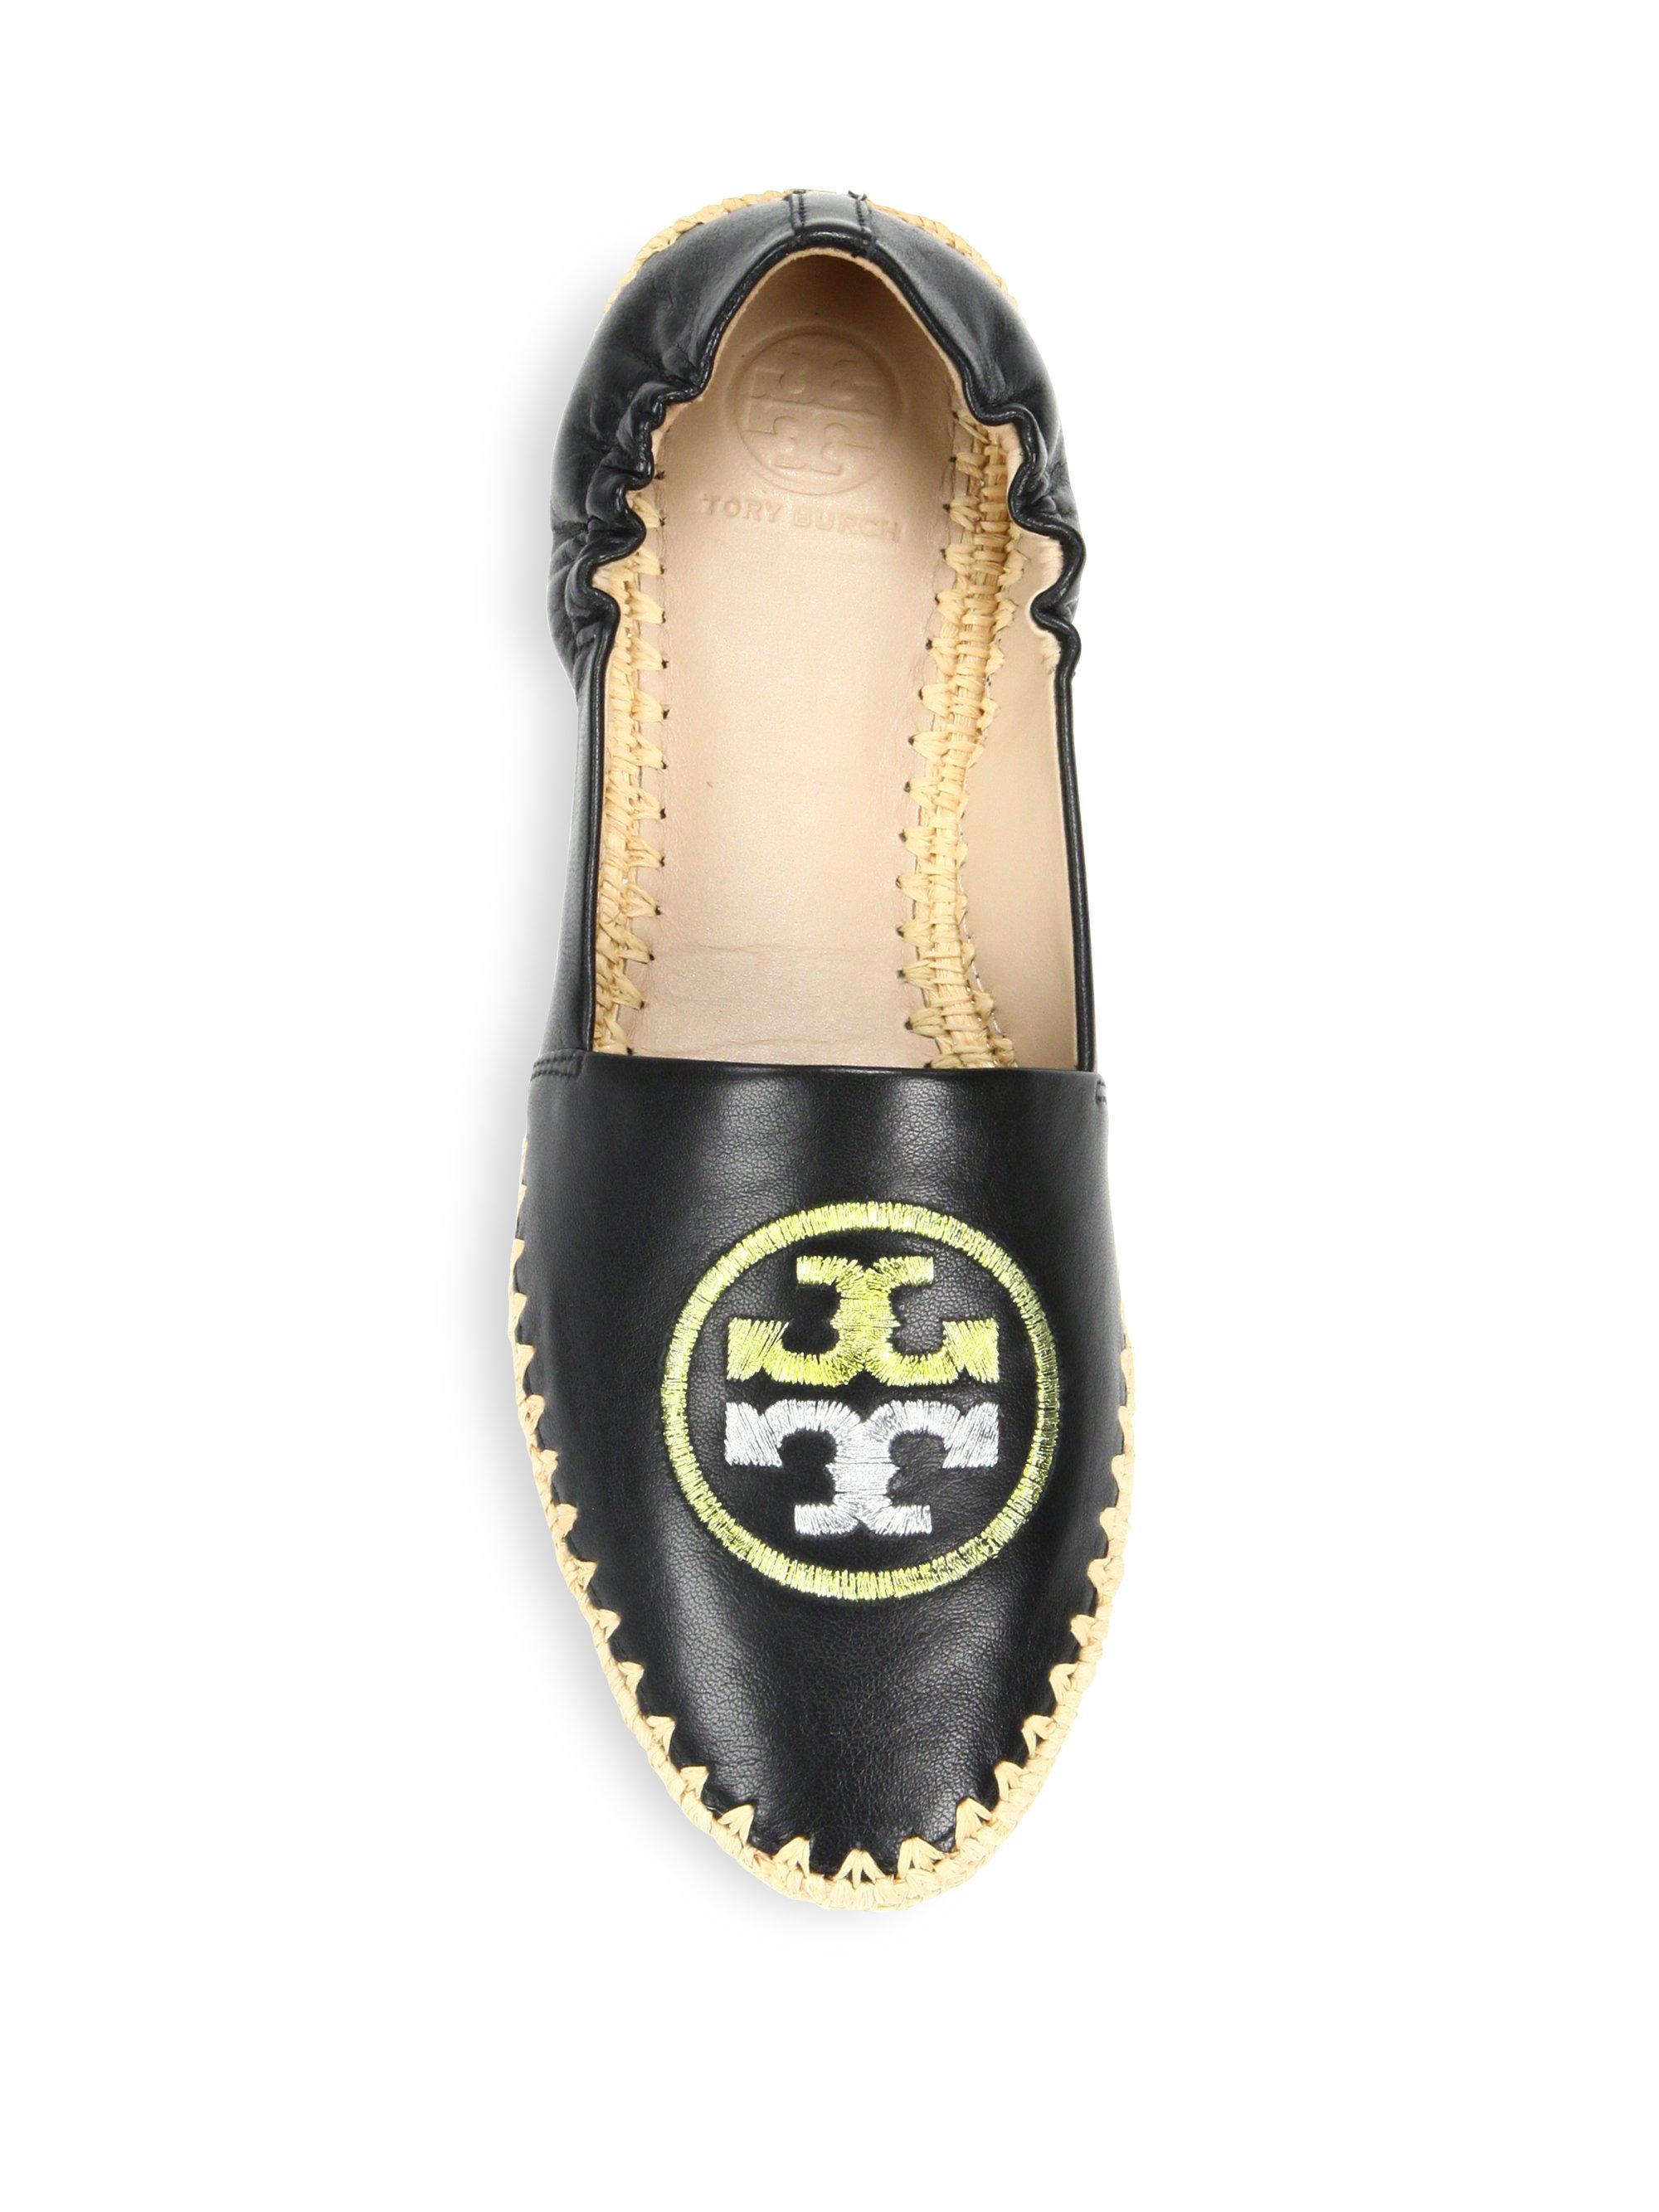 93e7bdd8585 Lyst - Tory Burch Darien Leather Espadrille Loafers in Black